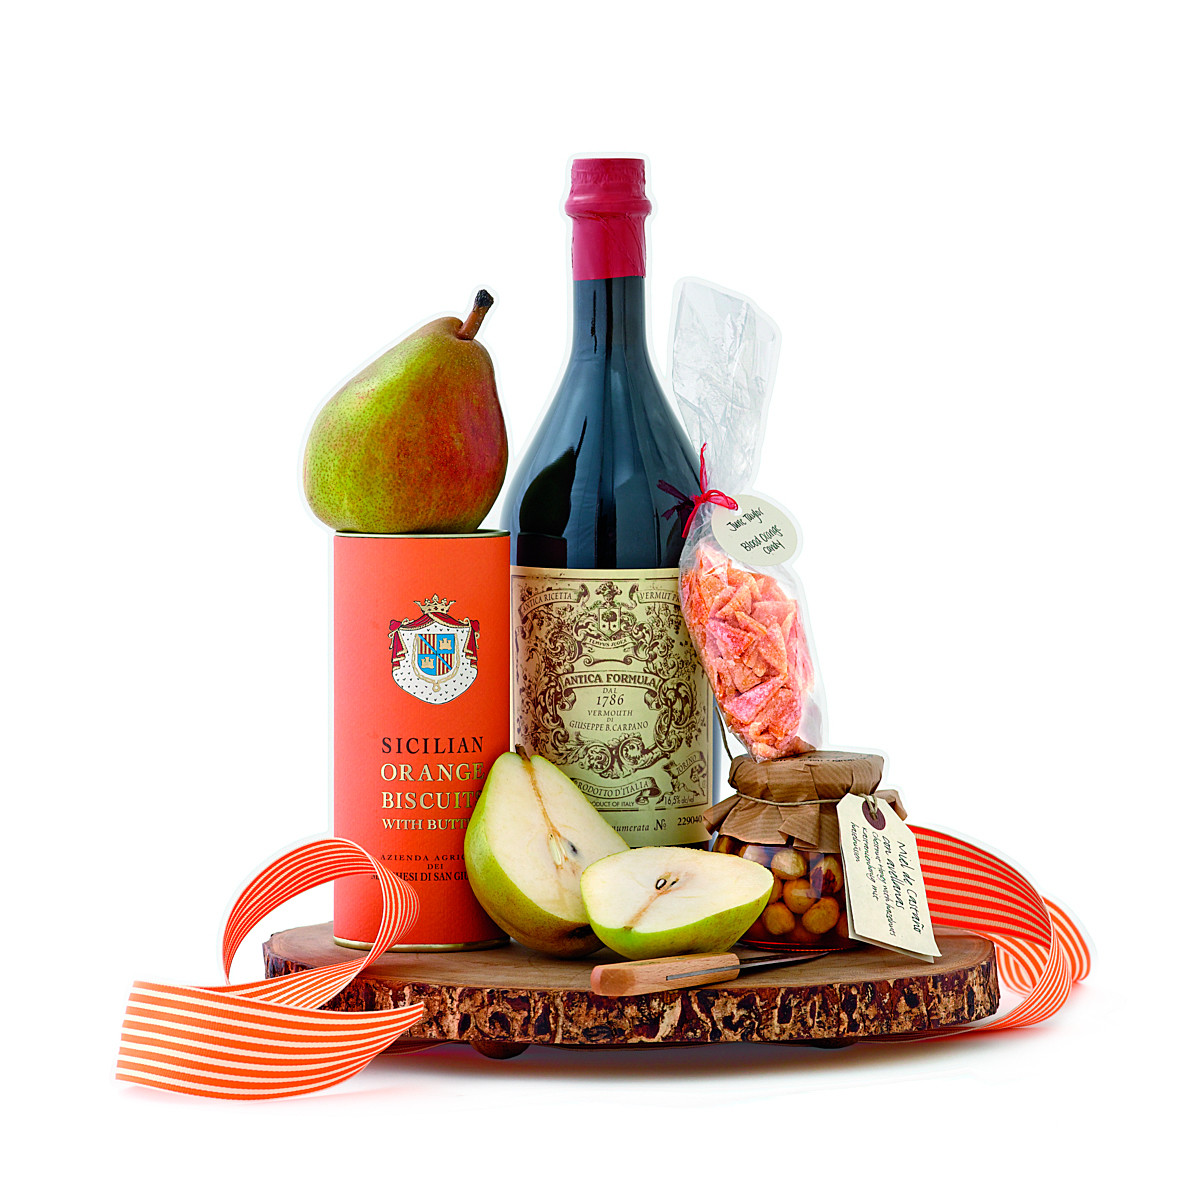 Home Decor Hostess Gifts: Hostess Gift Ideas